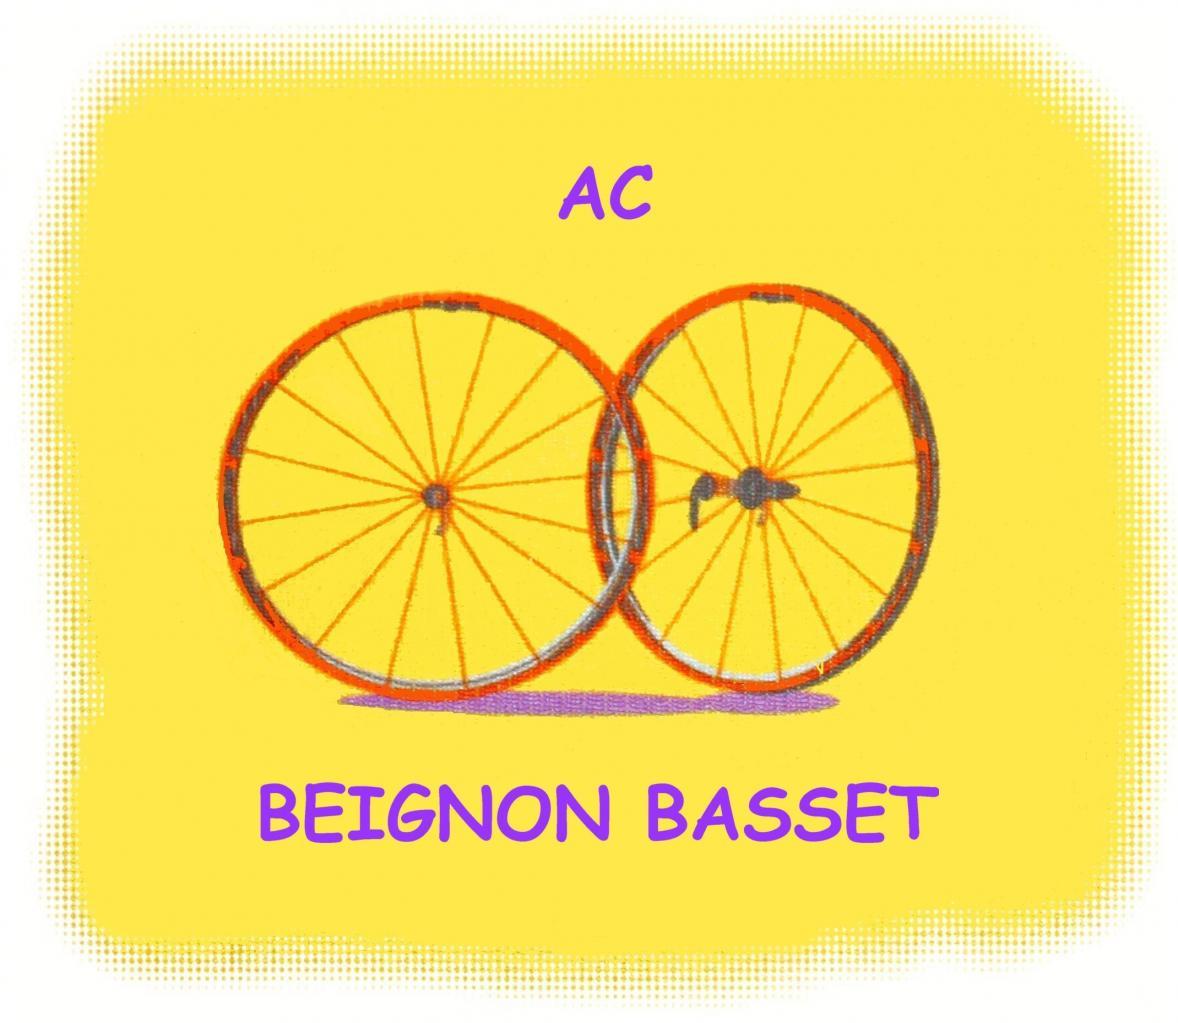 Association Cyclotourisme Beignon Basset